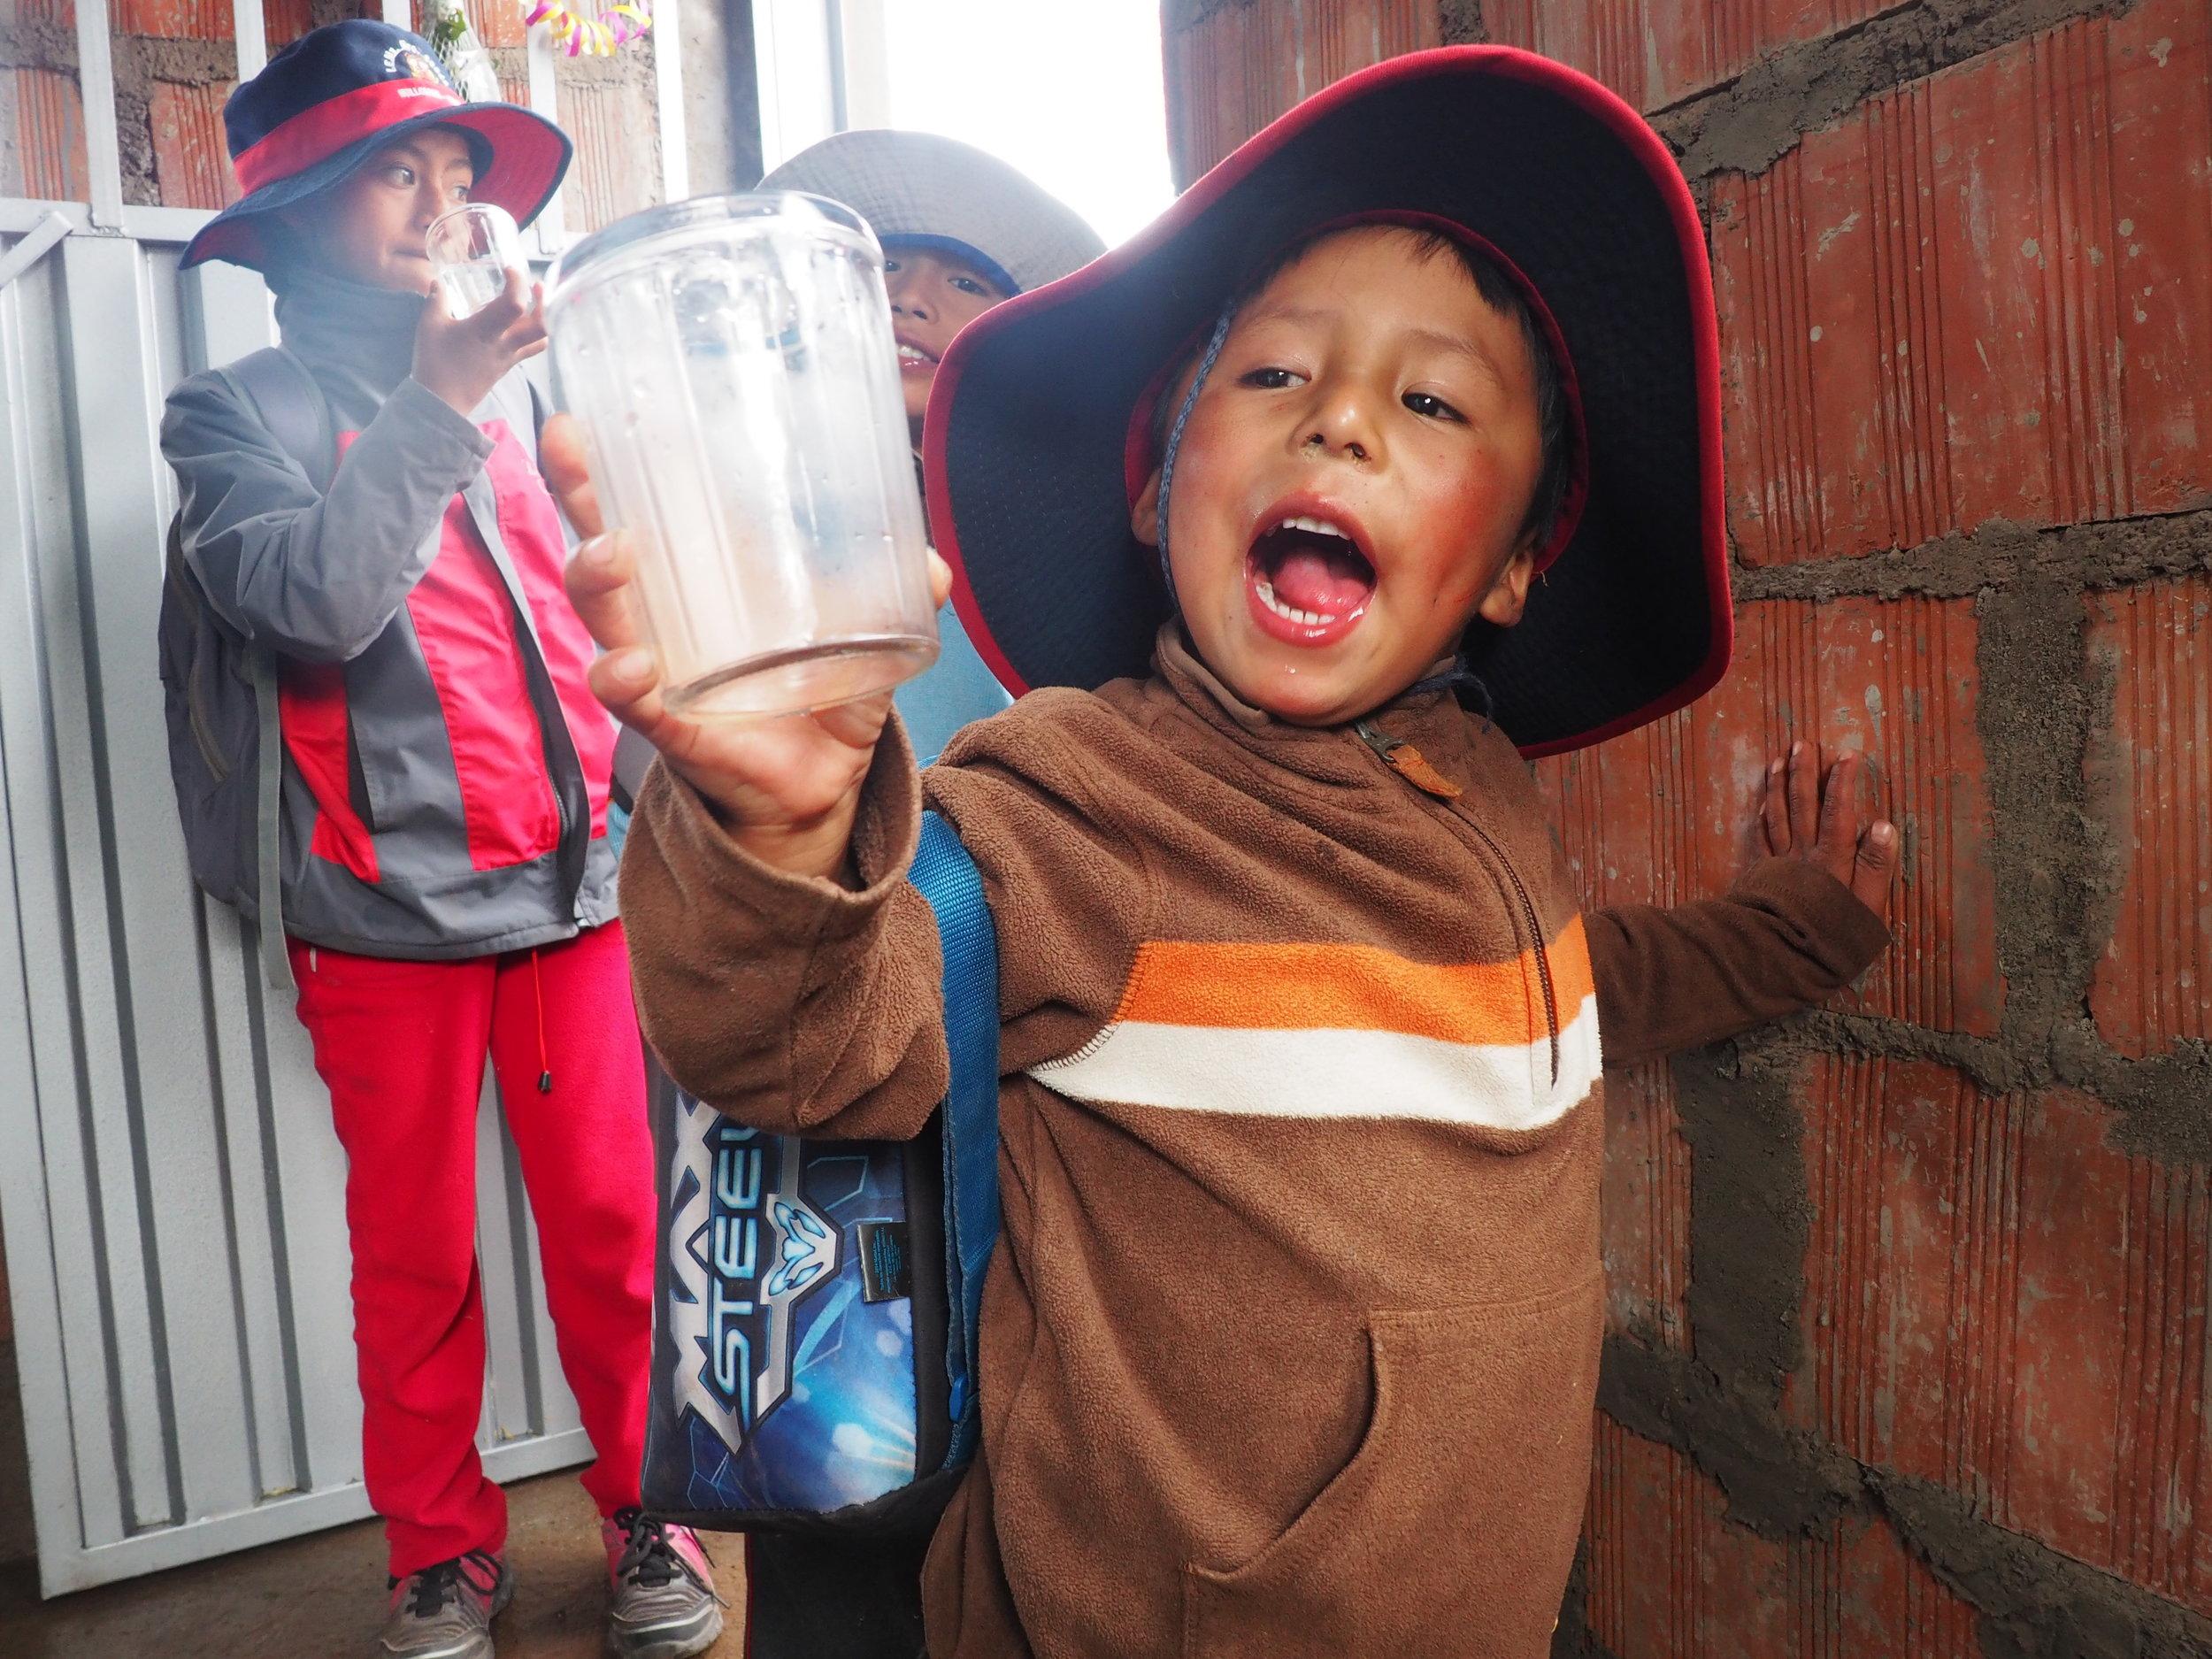 Nothing tastes quite as good as fresh clean water